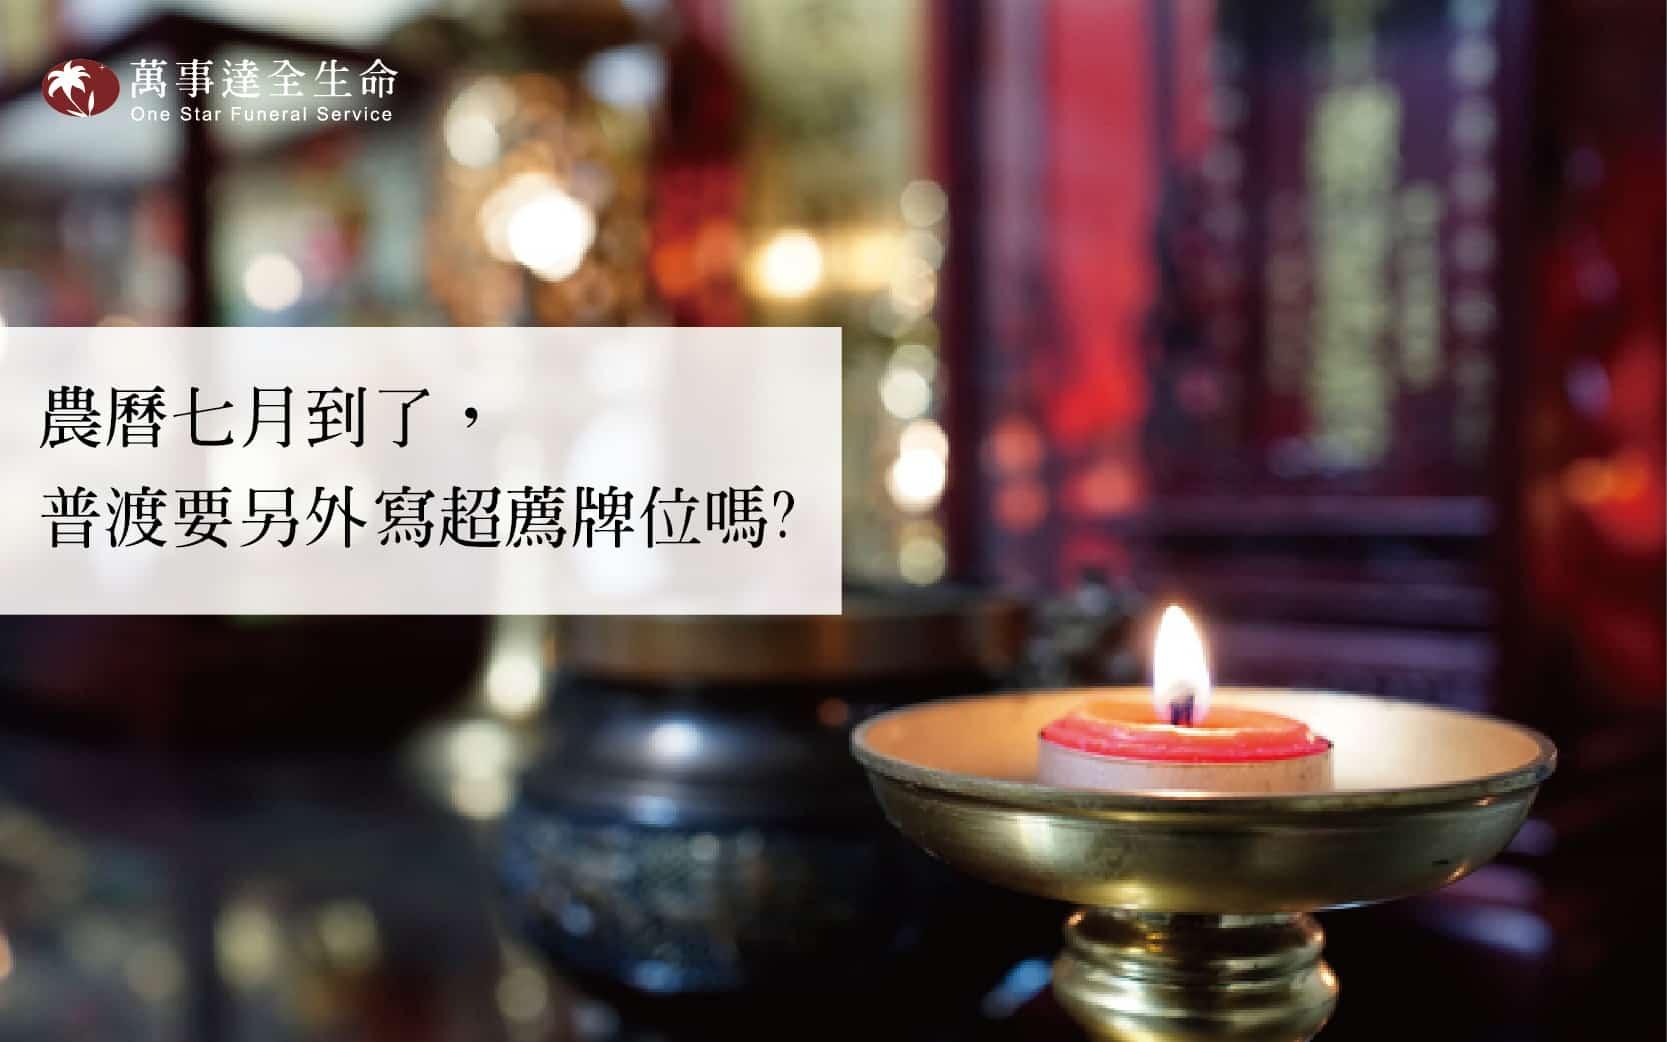 Read more about the article 農曆七月到了,普渡要另外寫超薦牌位嗎?